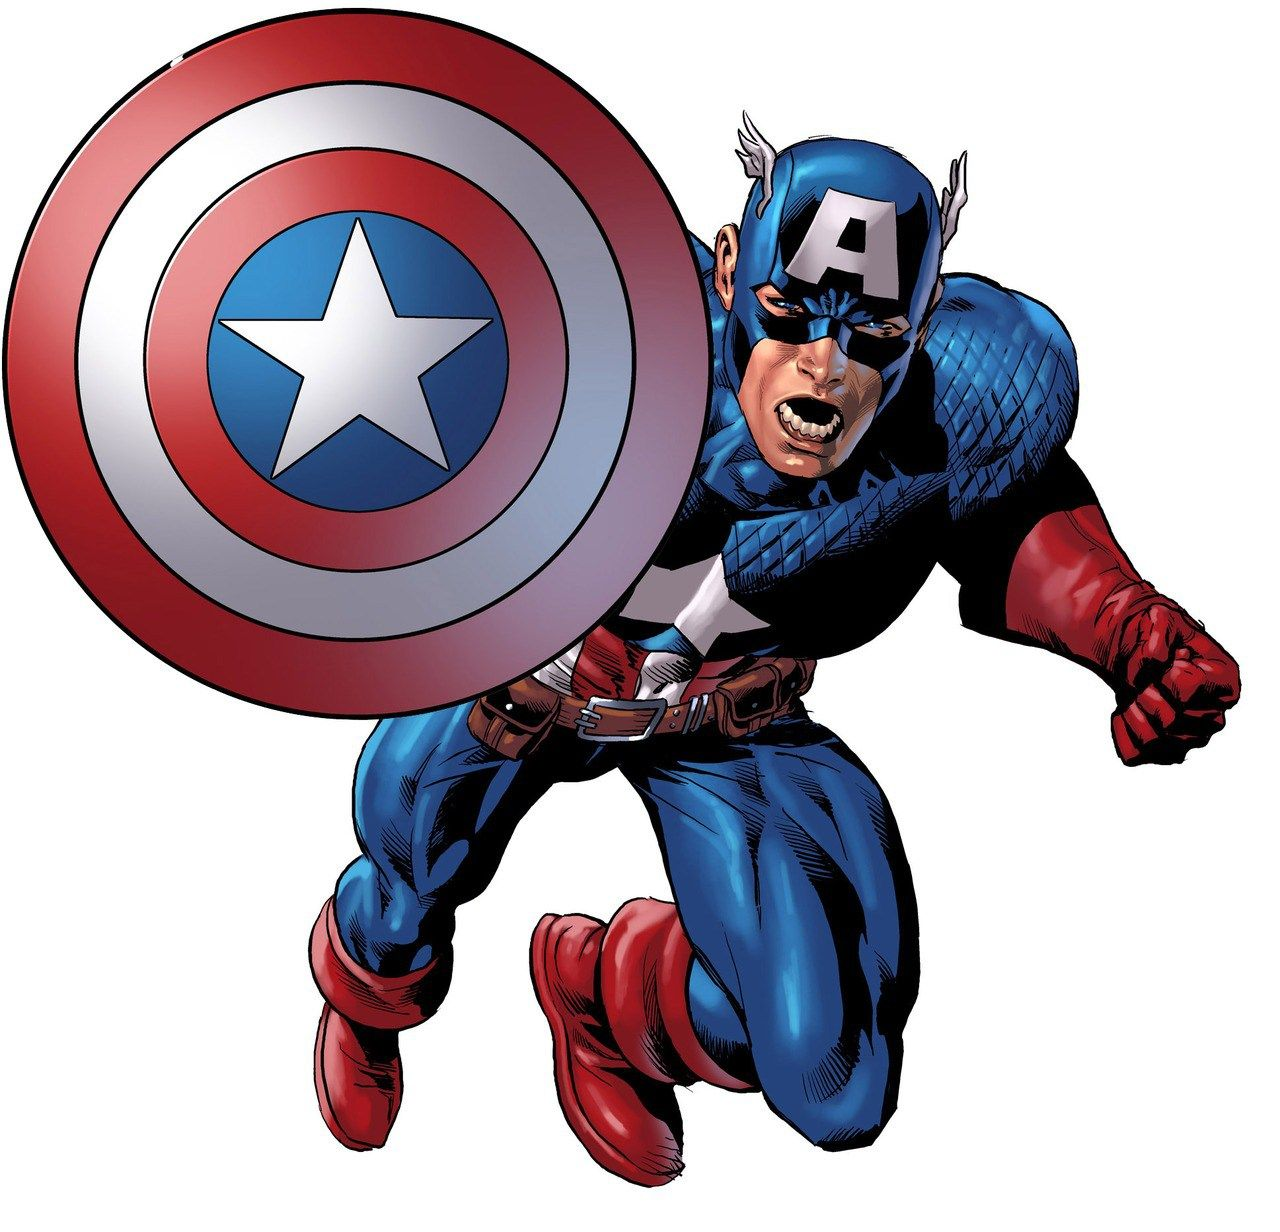 Captain America Comic Preneur Imagenes De Capitan America Capitan America Capitan America Dibujo